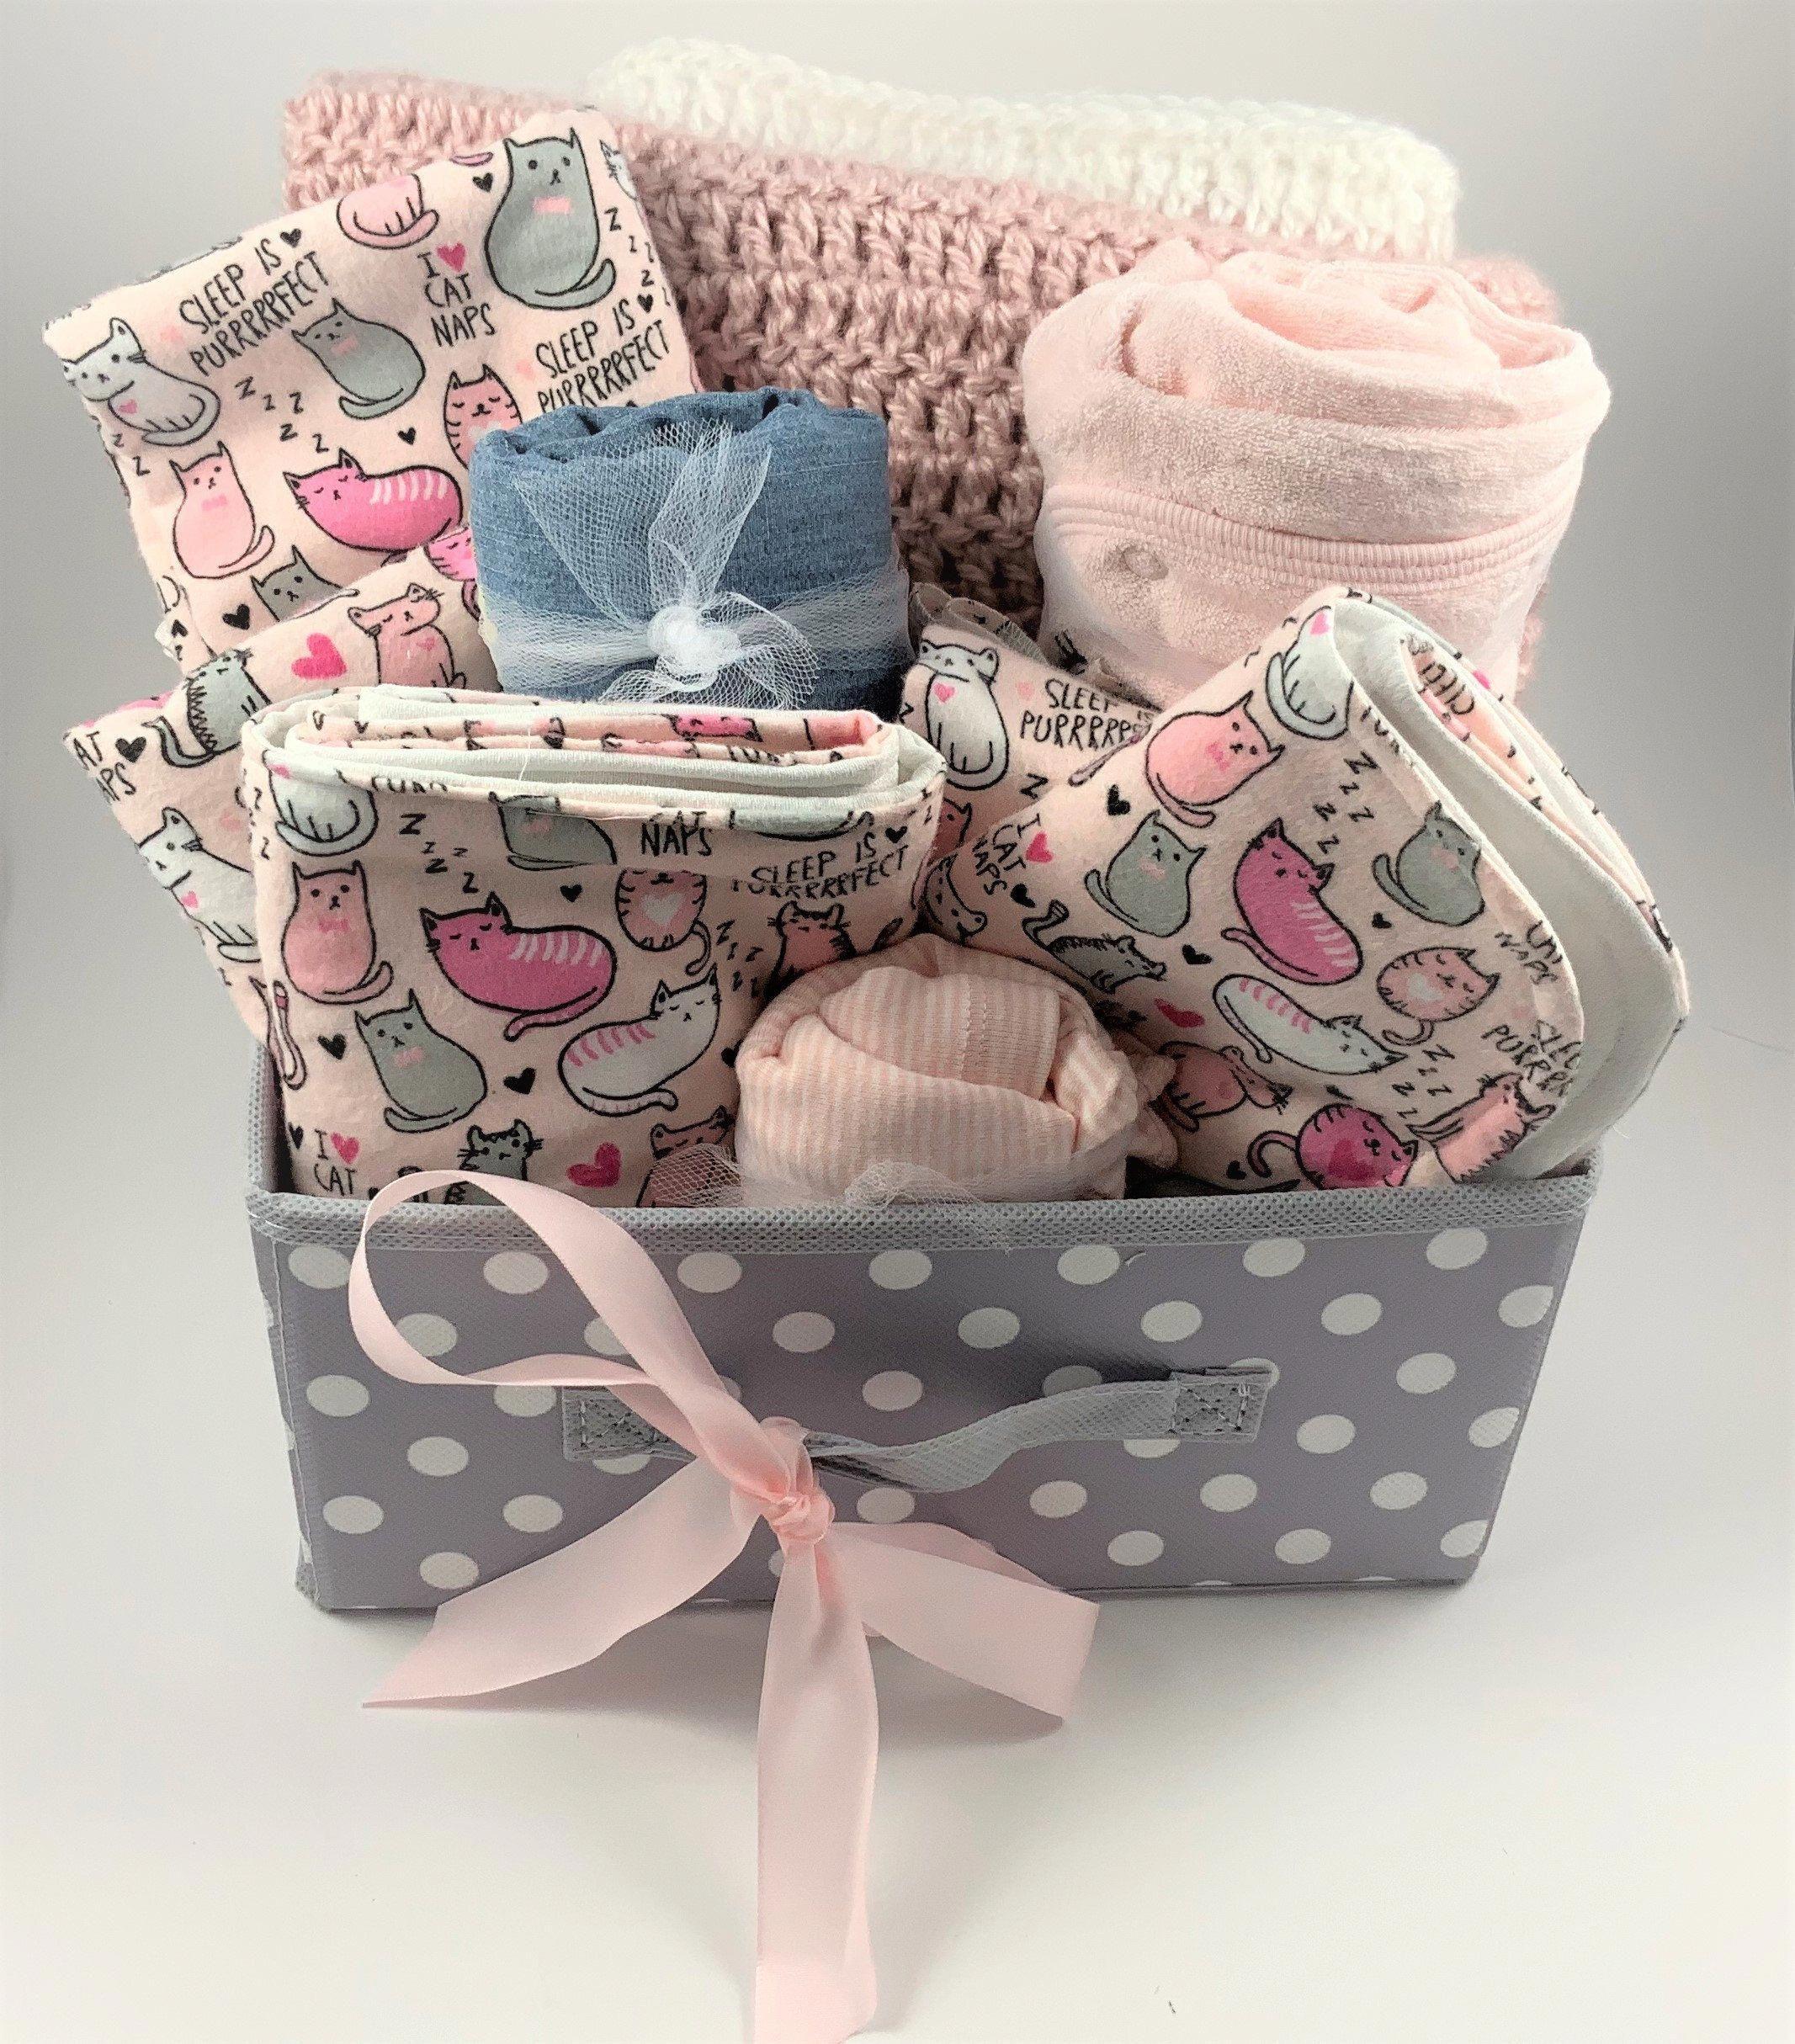 Baby Girl Gift Basket Baby Girl Kitten Burps All Handmade Etsy In 2020 Baby Girl Gift Baskets Pink Baby Gifts Baby Girl Gifts